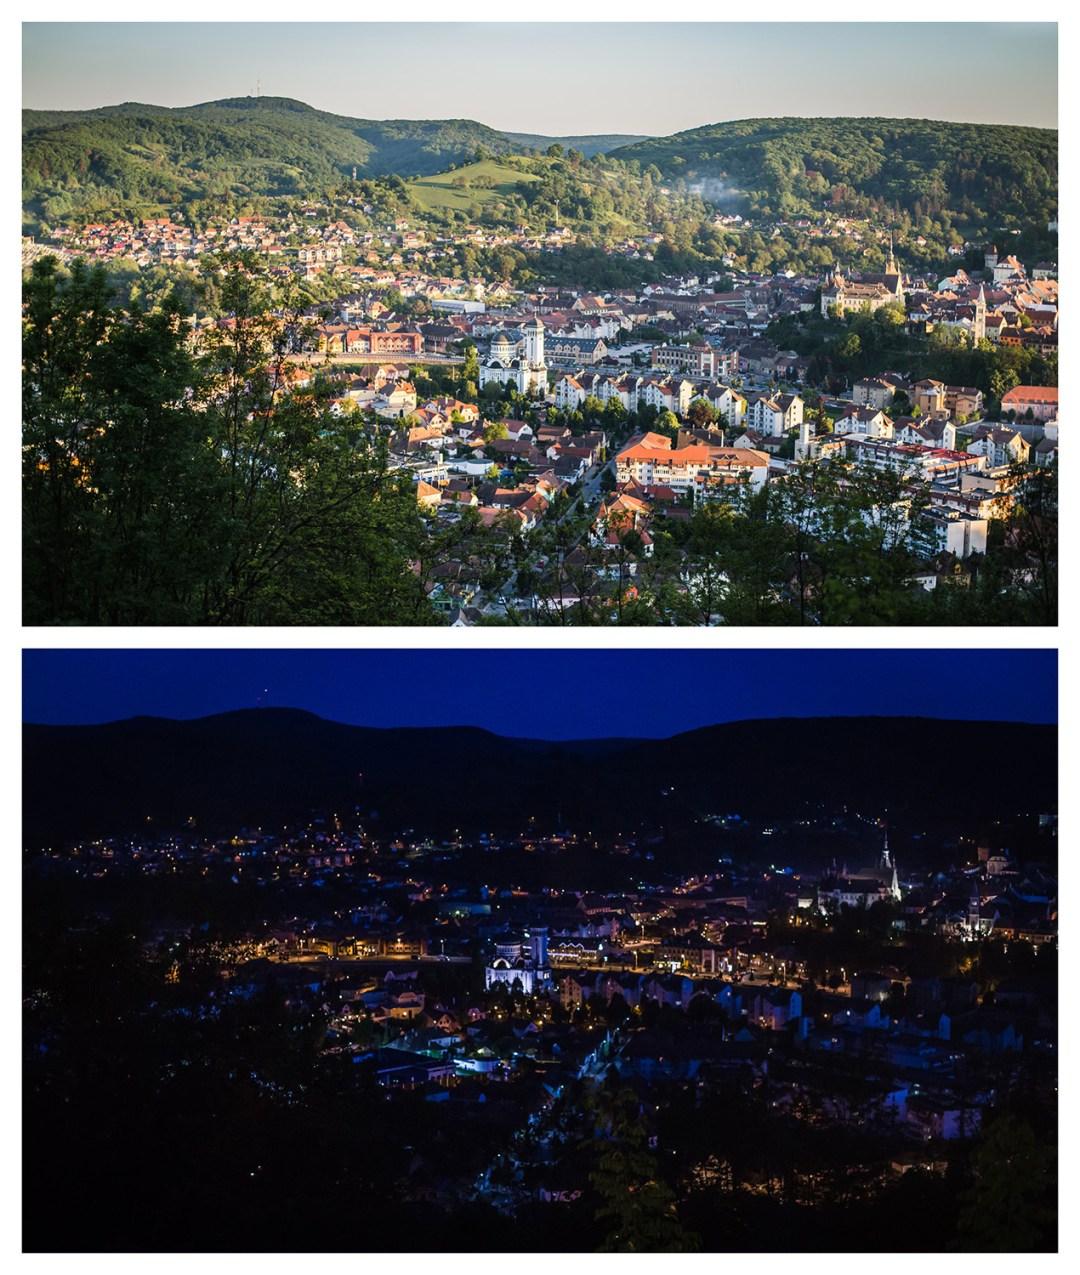 sighisoara day and night